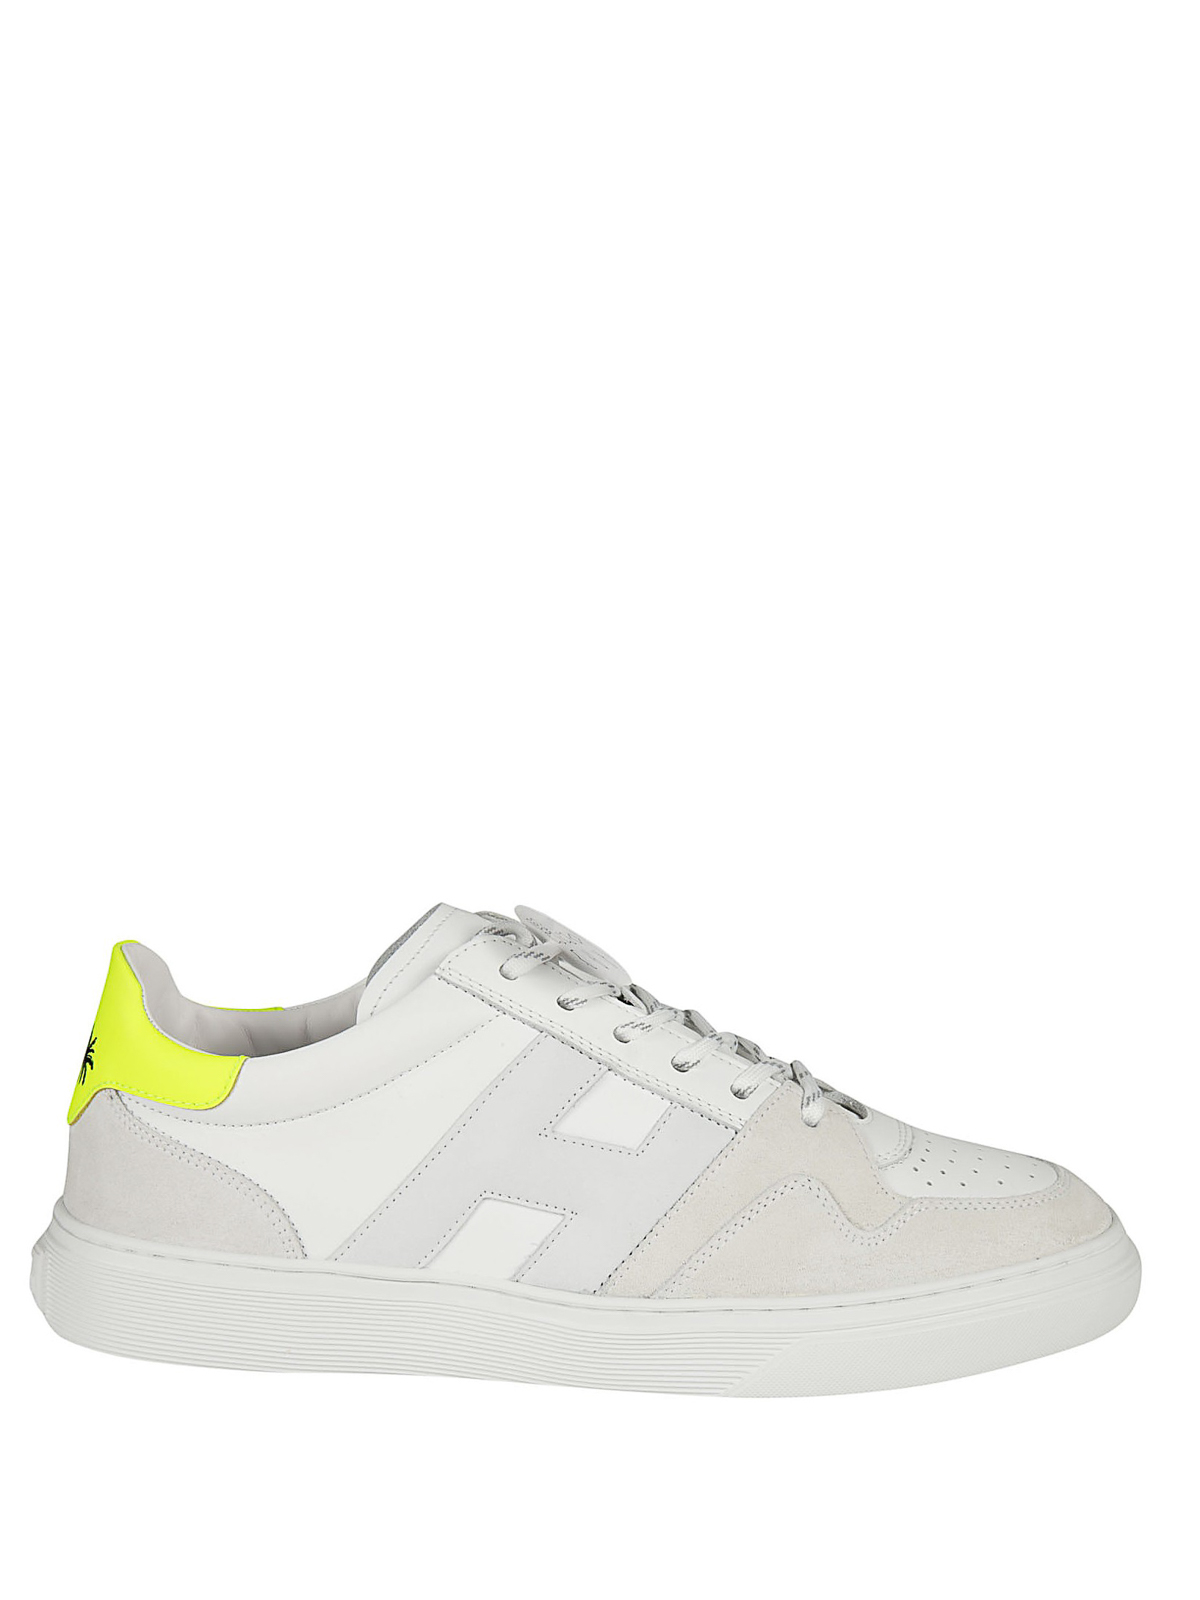 Hogan - H365 fluo heel basket style sneakers - trainers ...